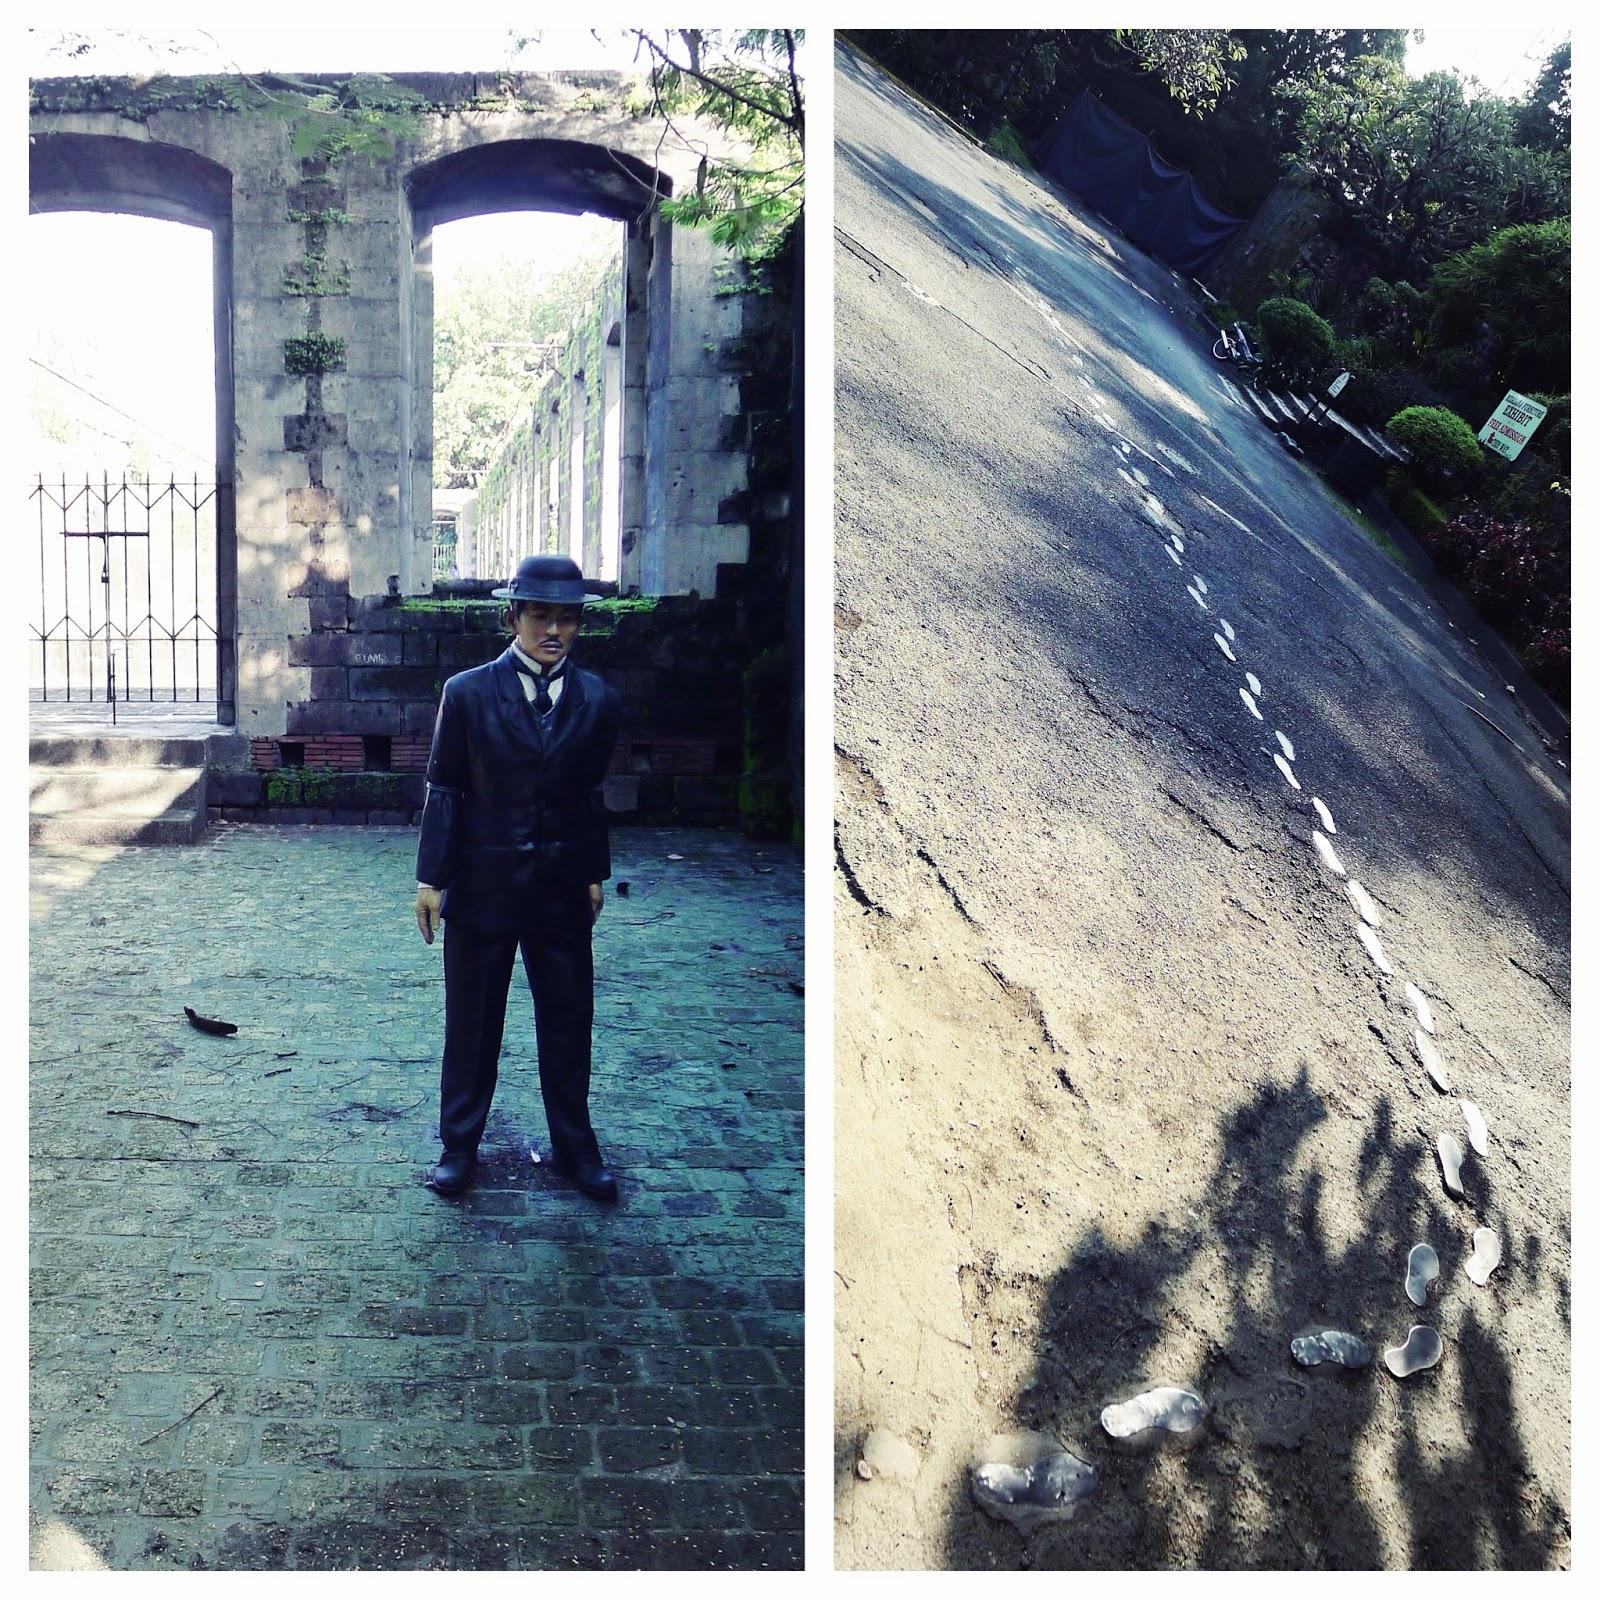 Fort Santiago Jose Rizal Prison